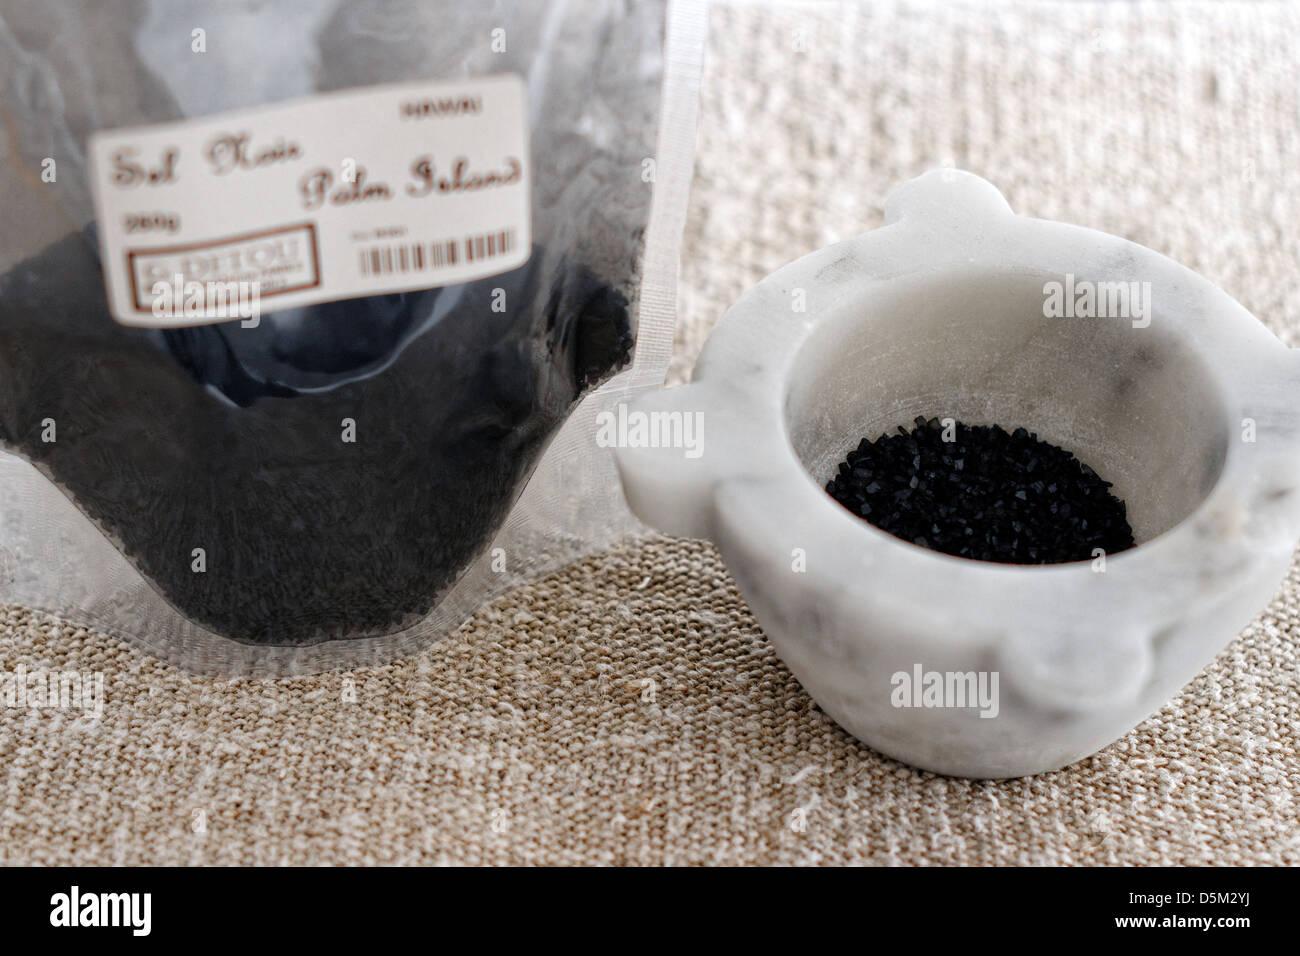 Black salt or sel noir - Stock Image